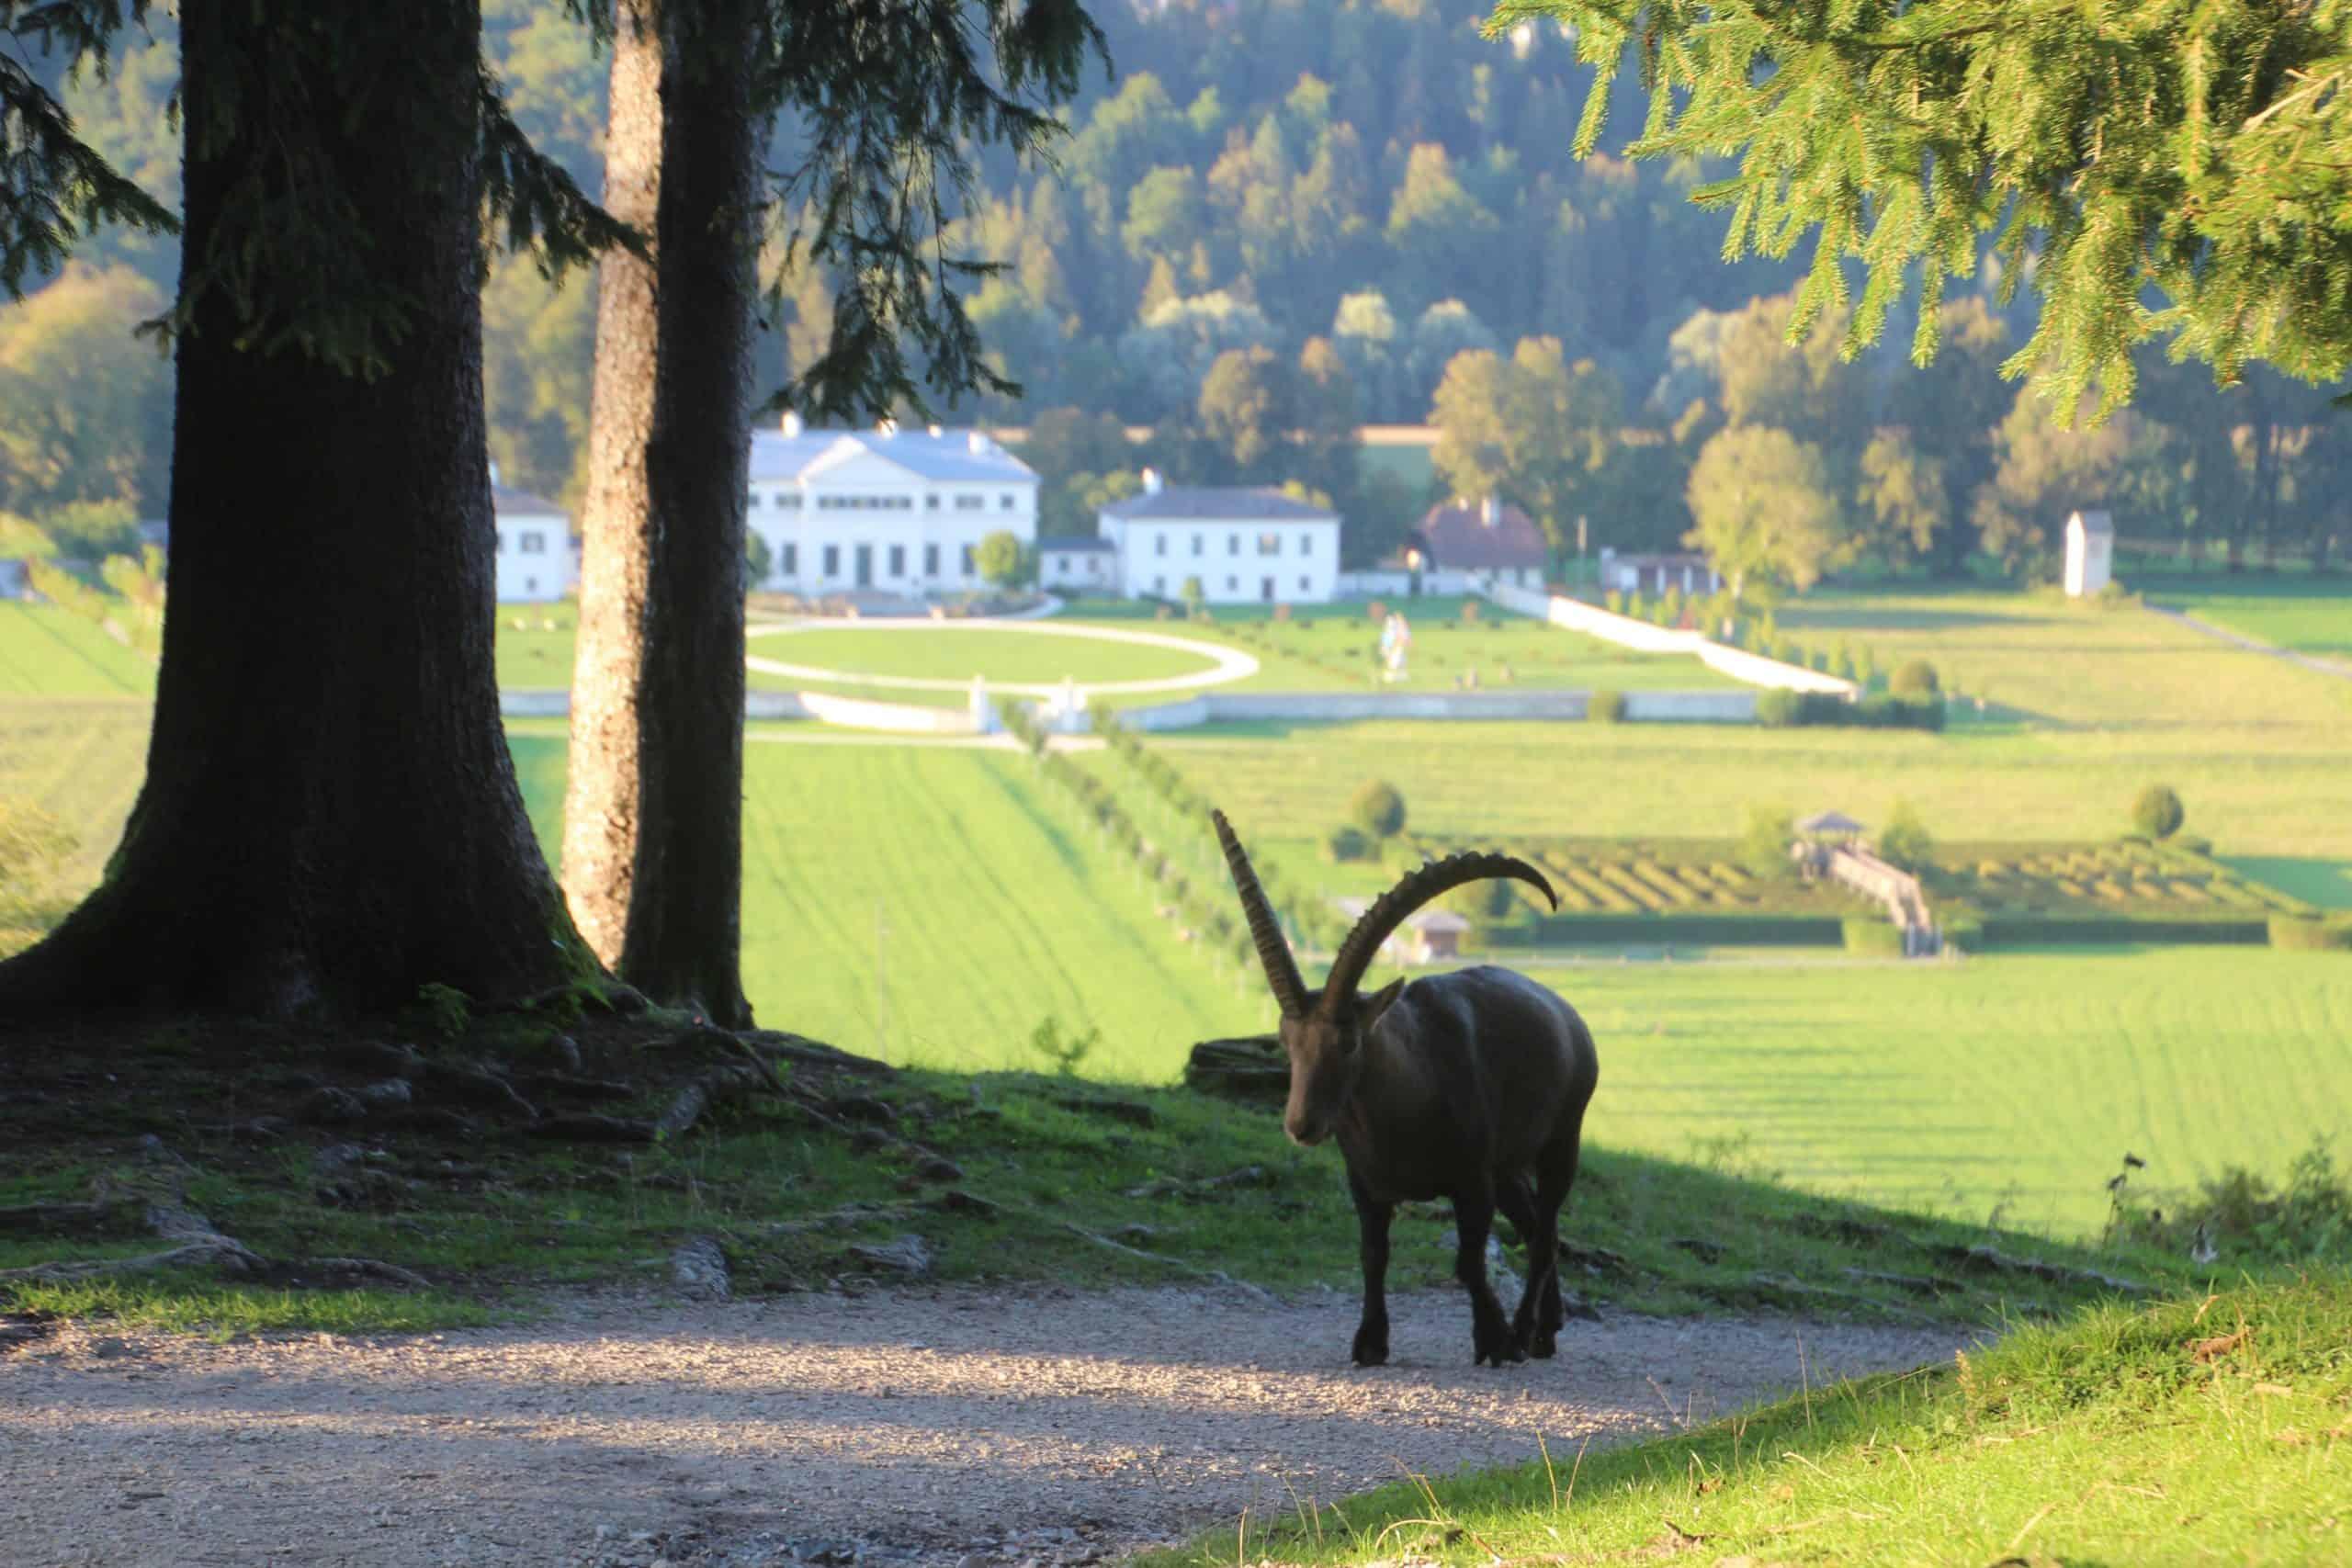 Tierpark Rosegg Ausflugsziel mit Schloss in Kärnten